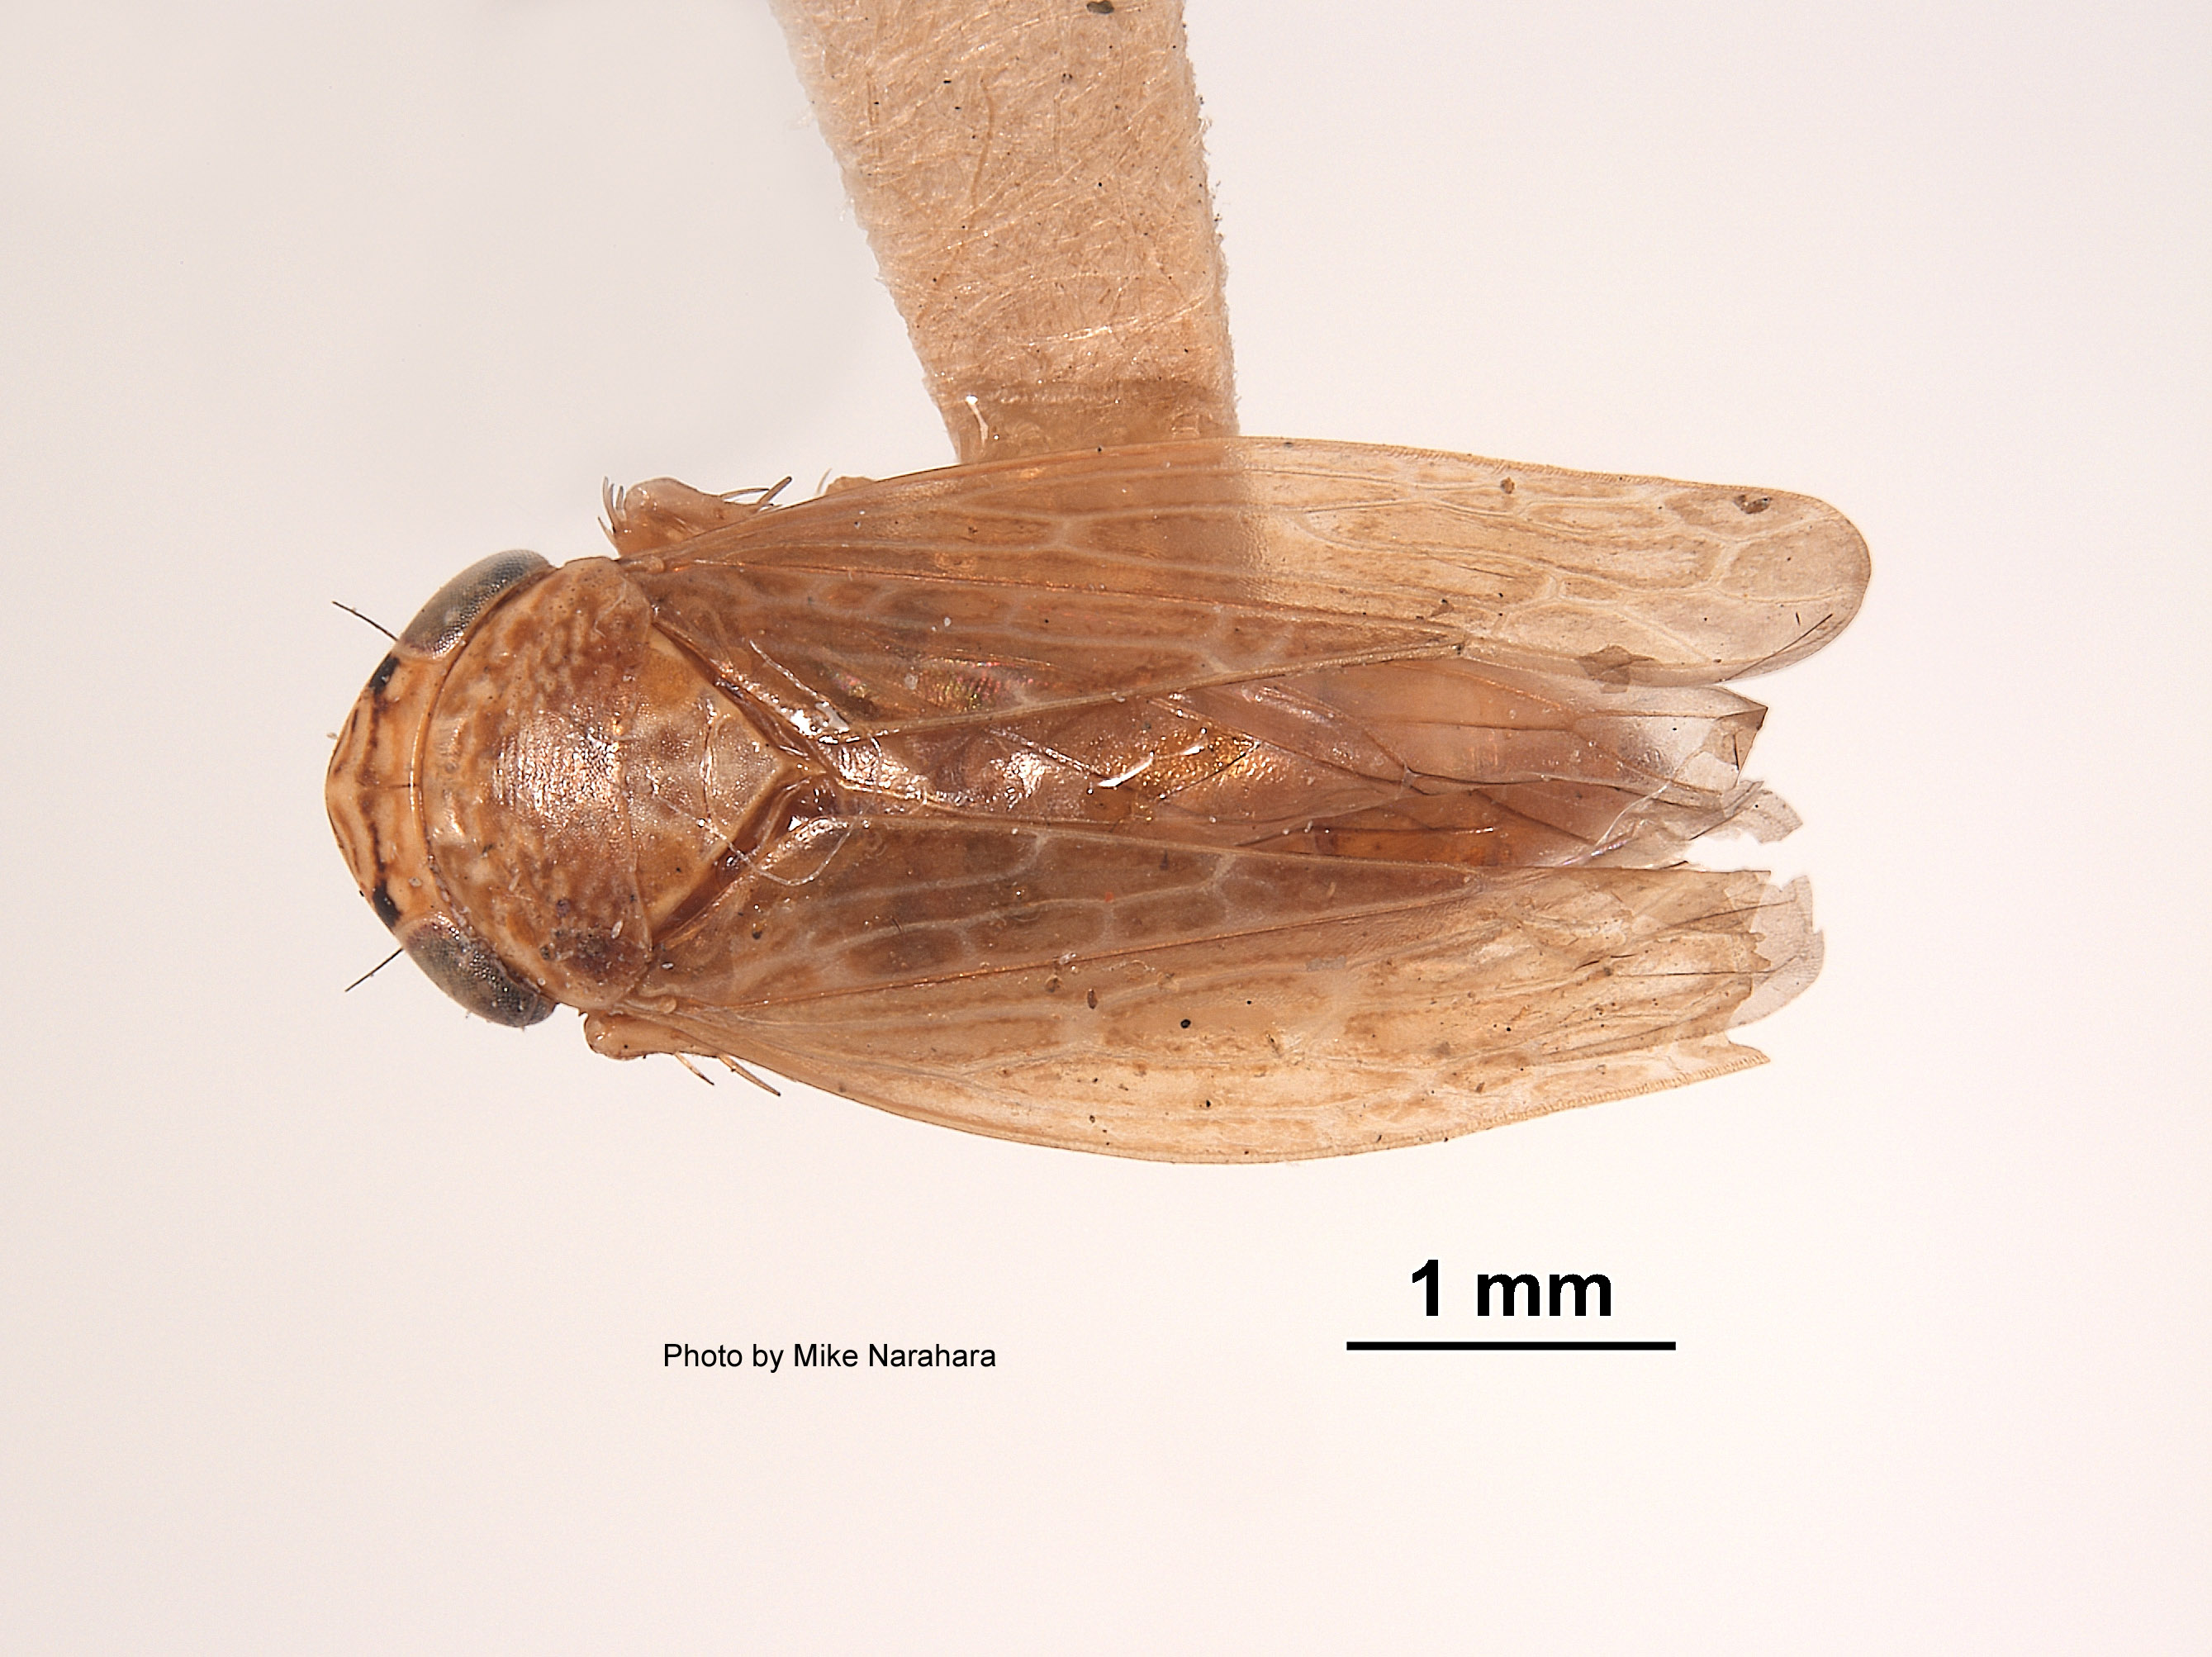 Euscelis finitimus image